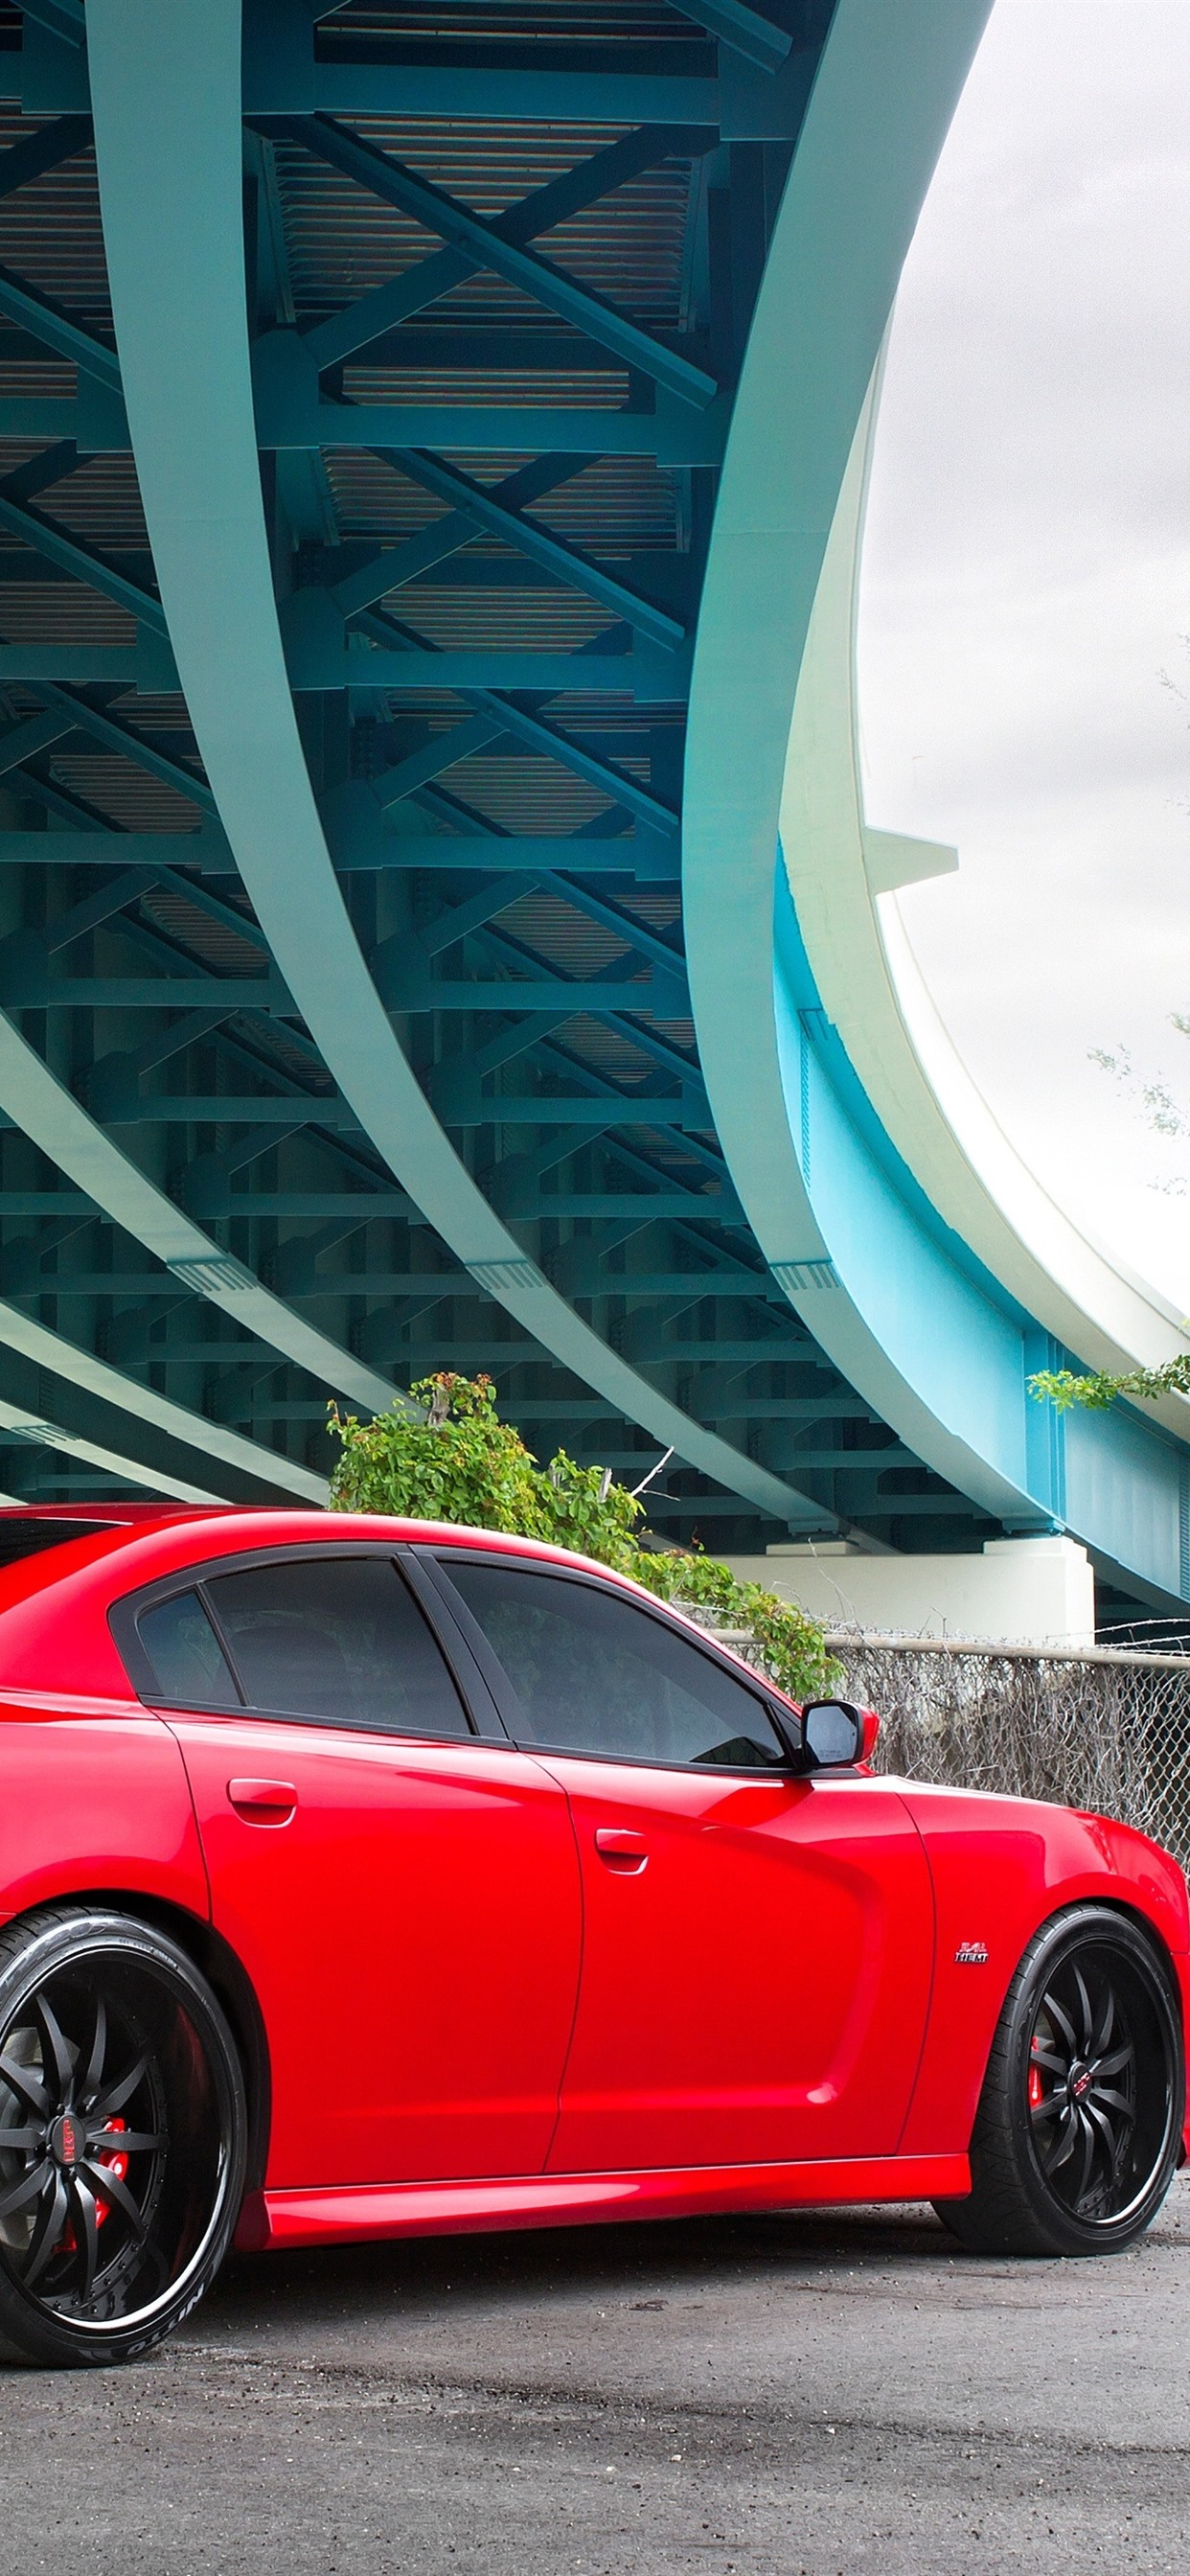 Dodge SRT8 red car 1242x2688 iPhone 11